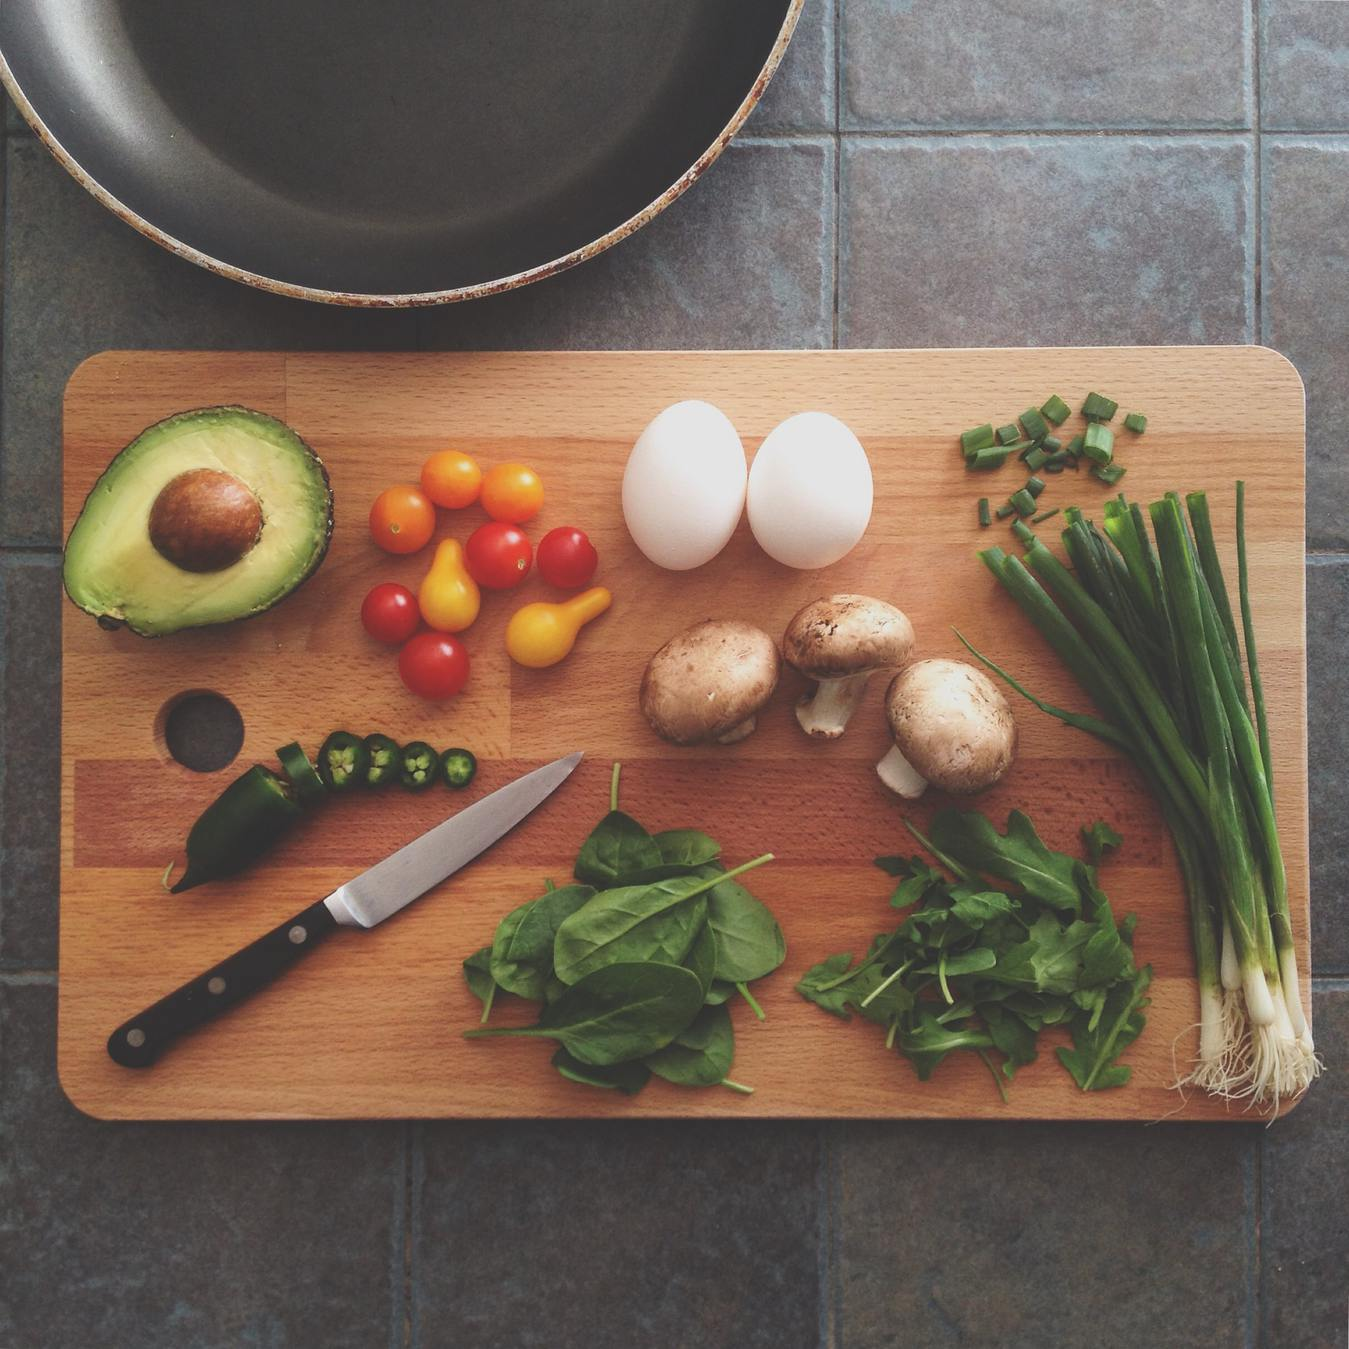 Sayur-sayuran di atas talenan